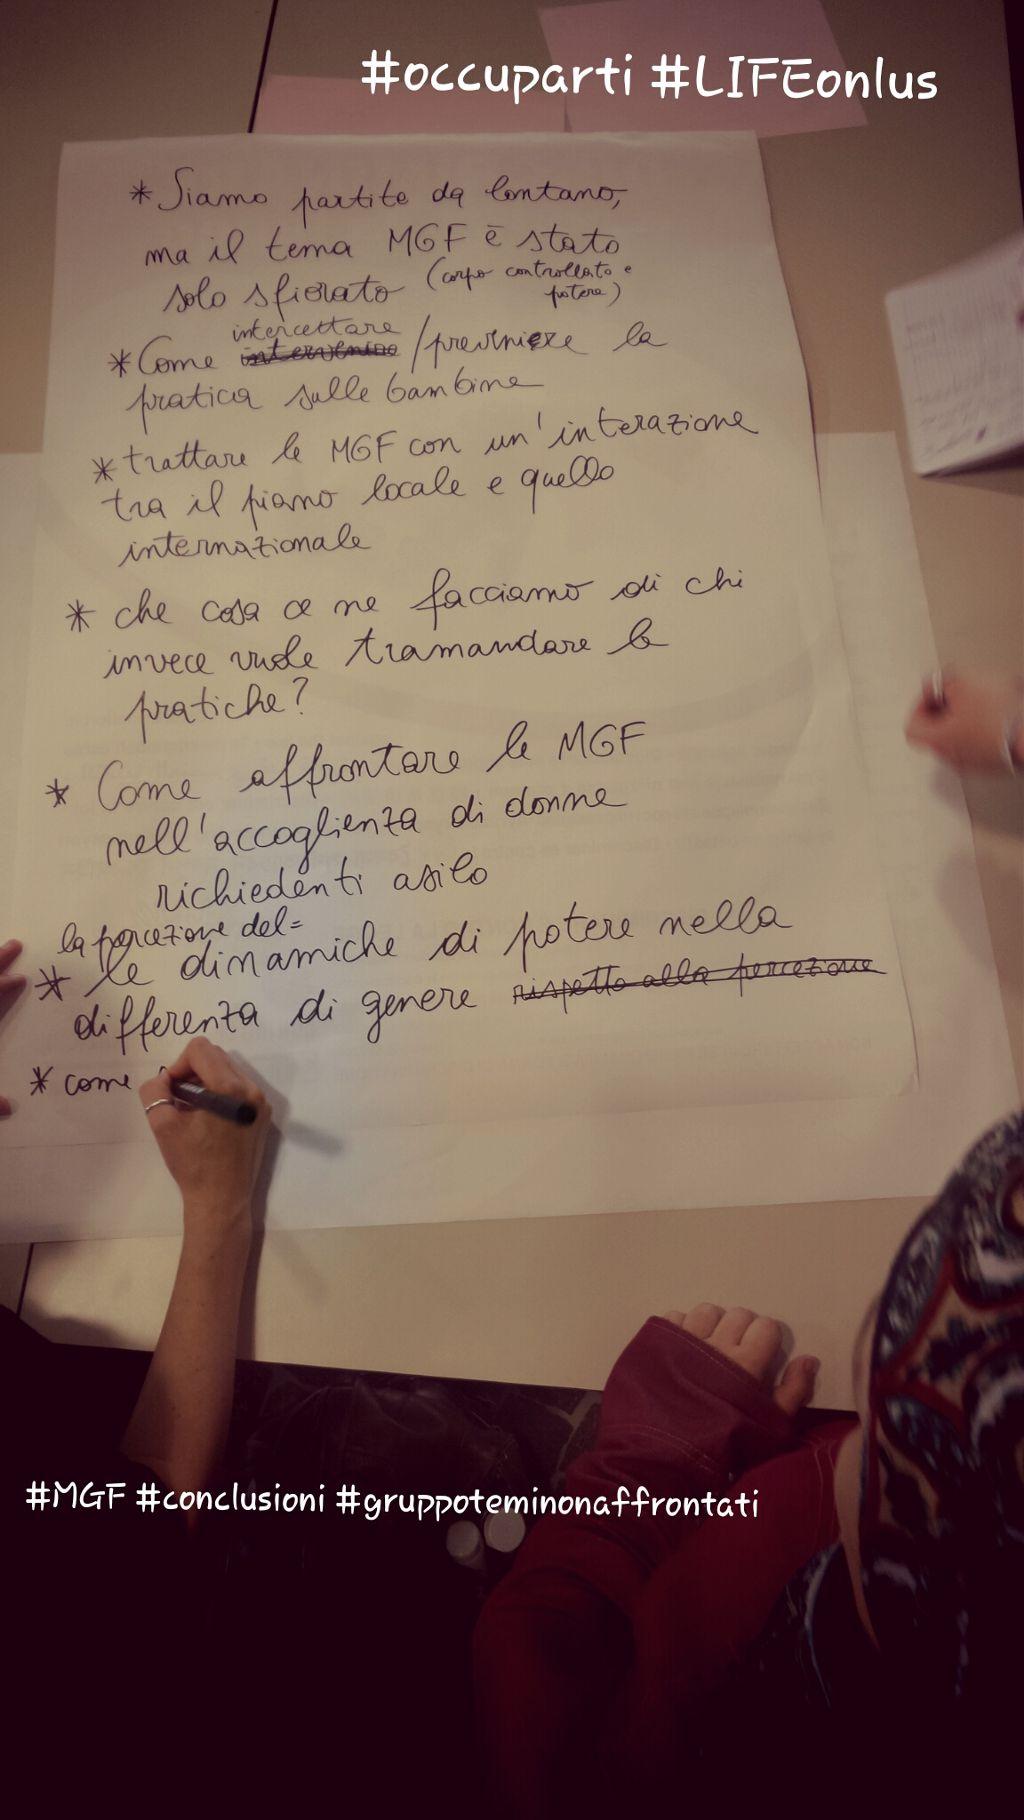 #MGF #conclusioni #gruppoteminonaffrontati #MGFravenna #LIFEonlus #icorpideglialtri